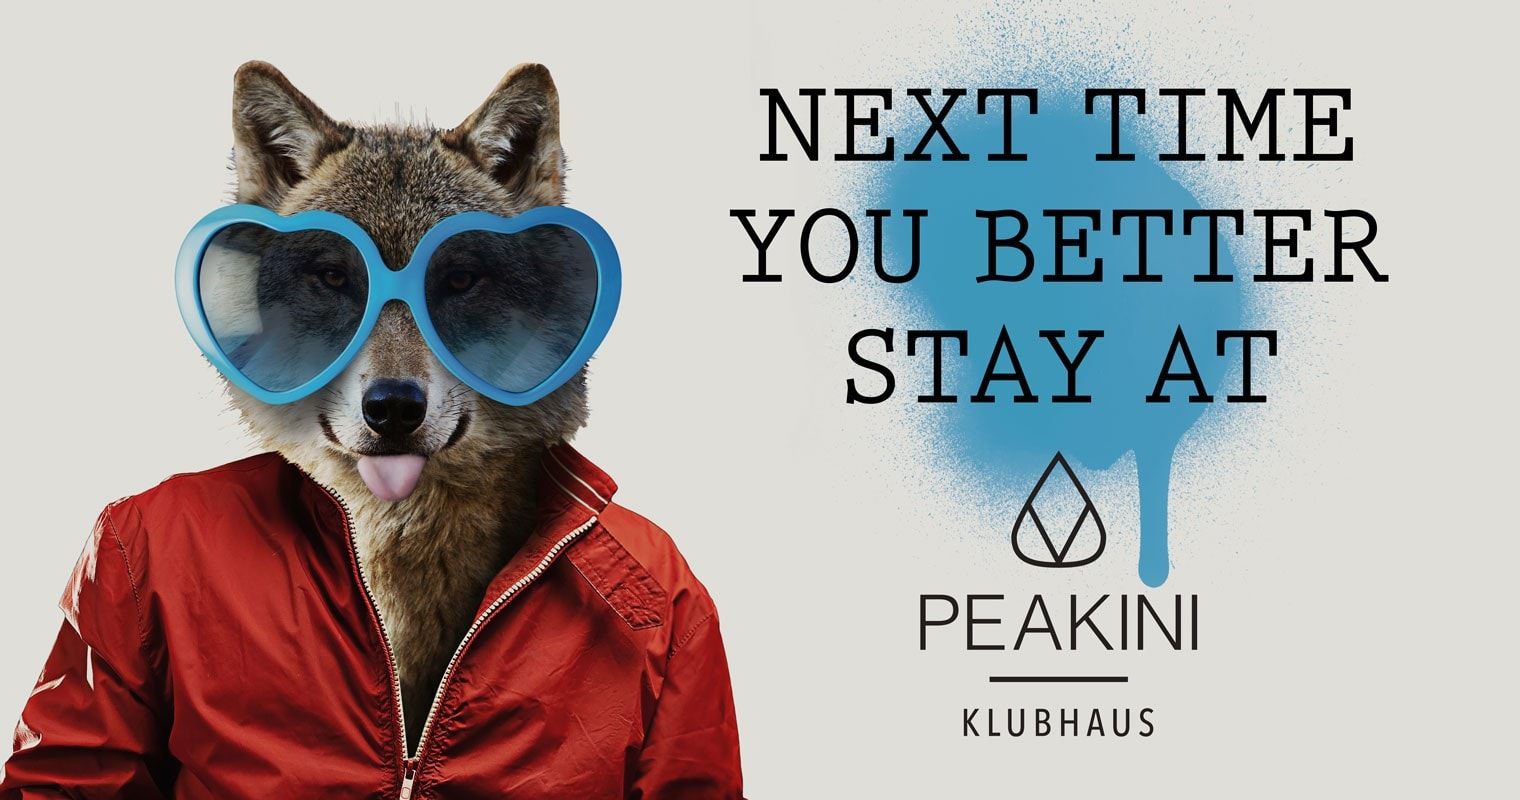 PEA Stay at Peakini Bildschirmwerbung 1520x800 - PEAKINI KLUBHAUS JÄNNER SPECIAL